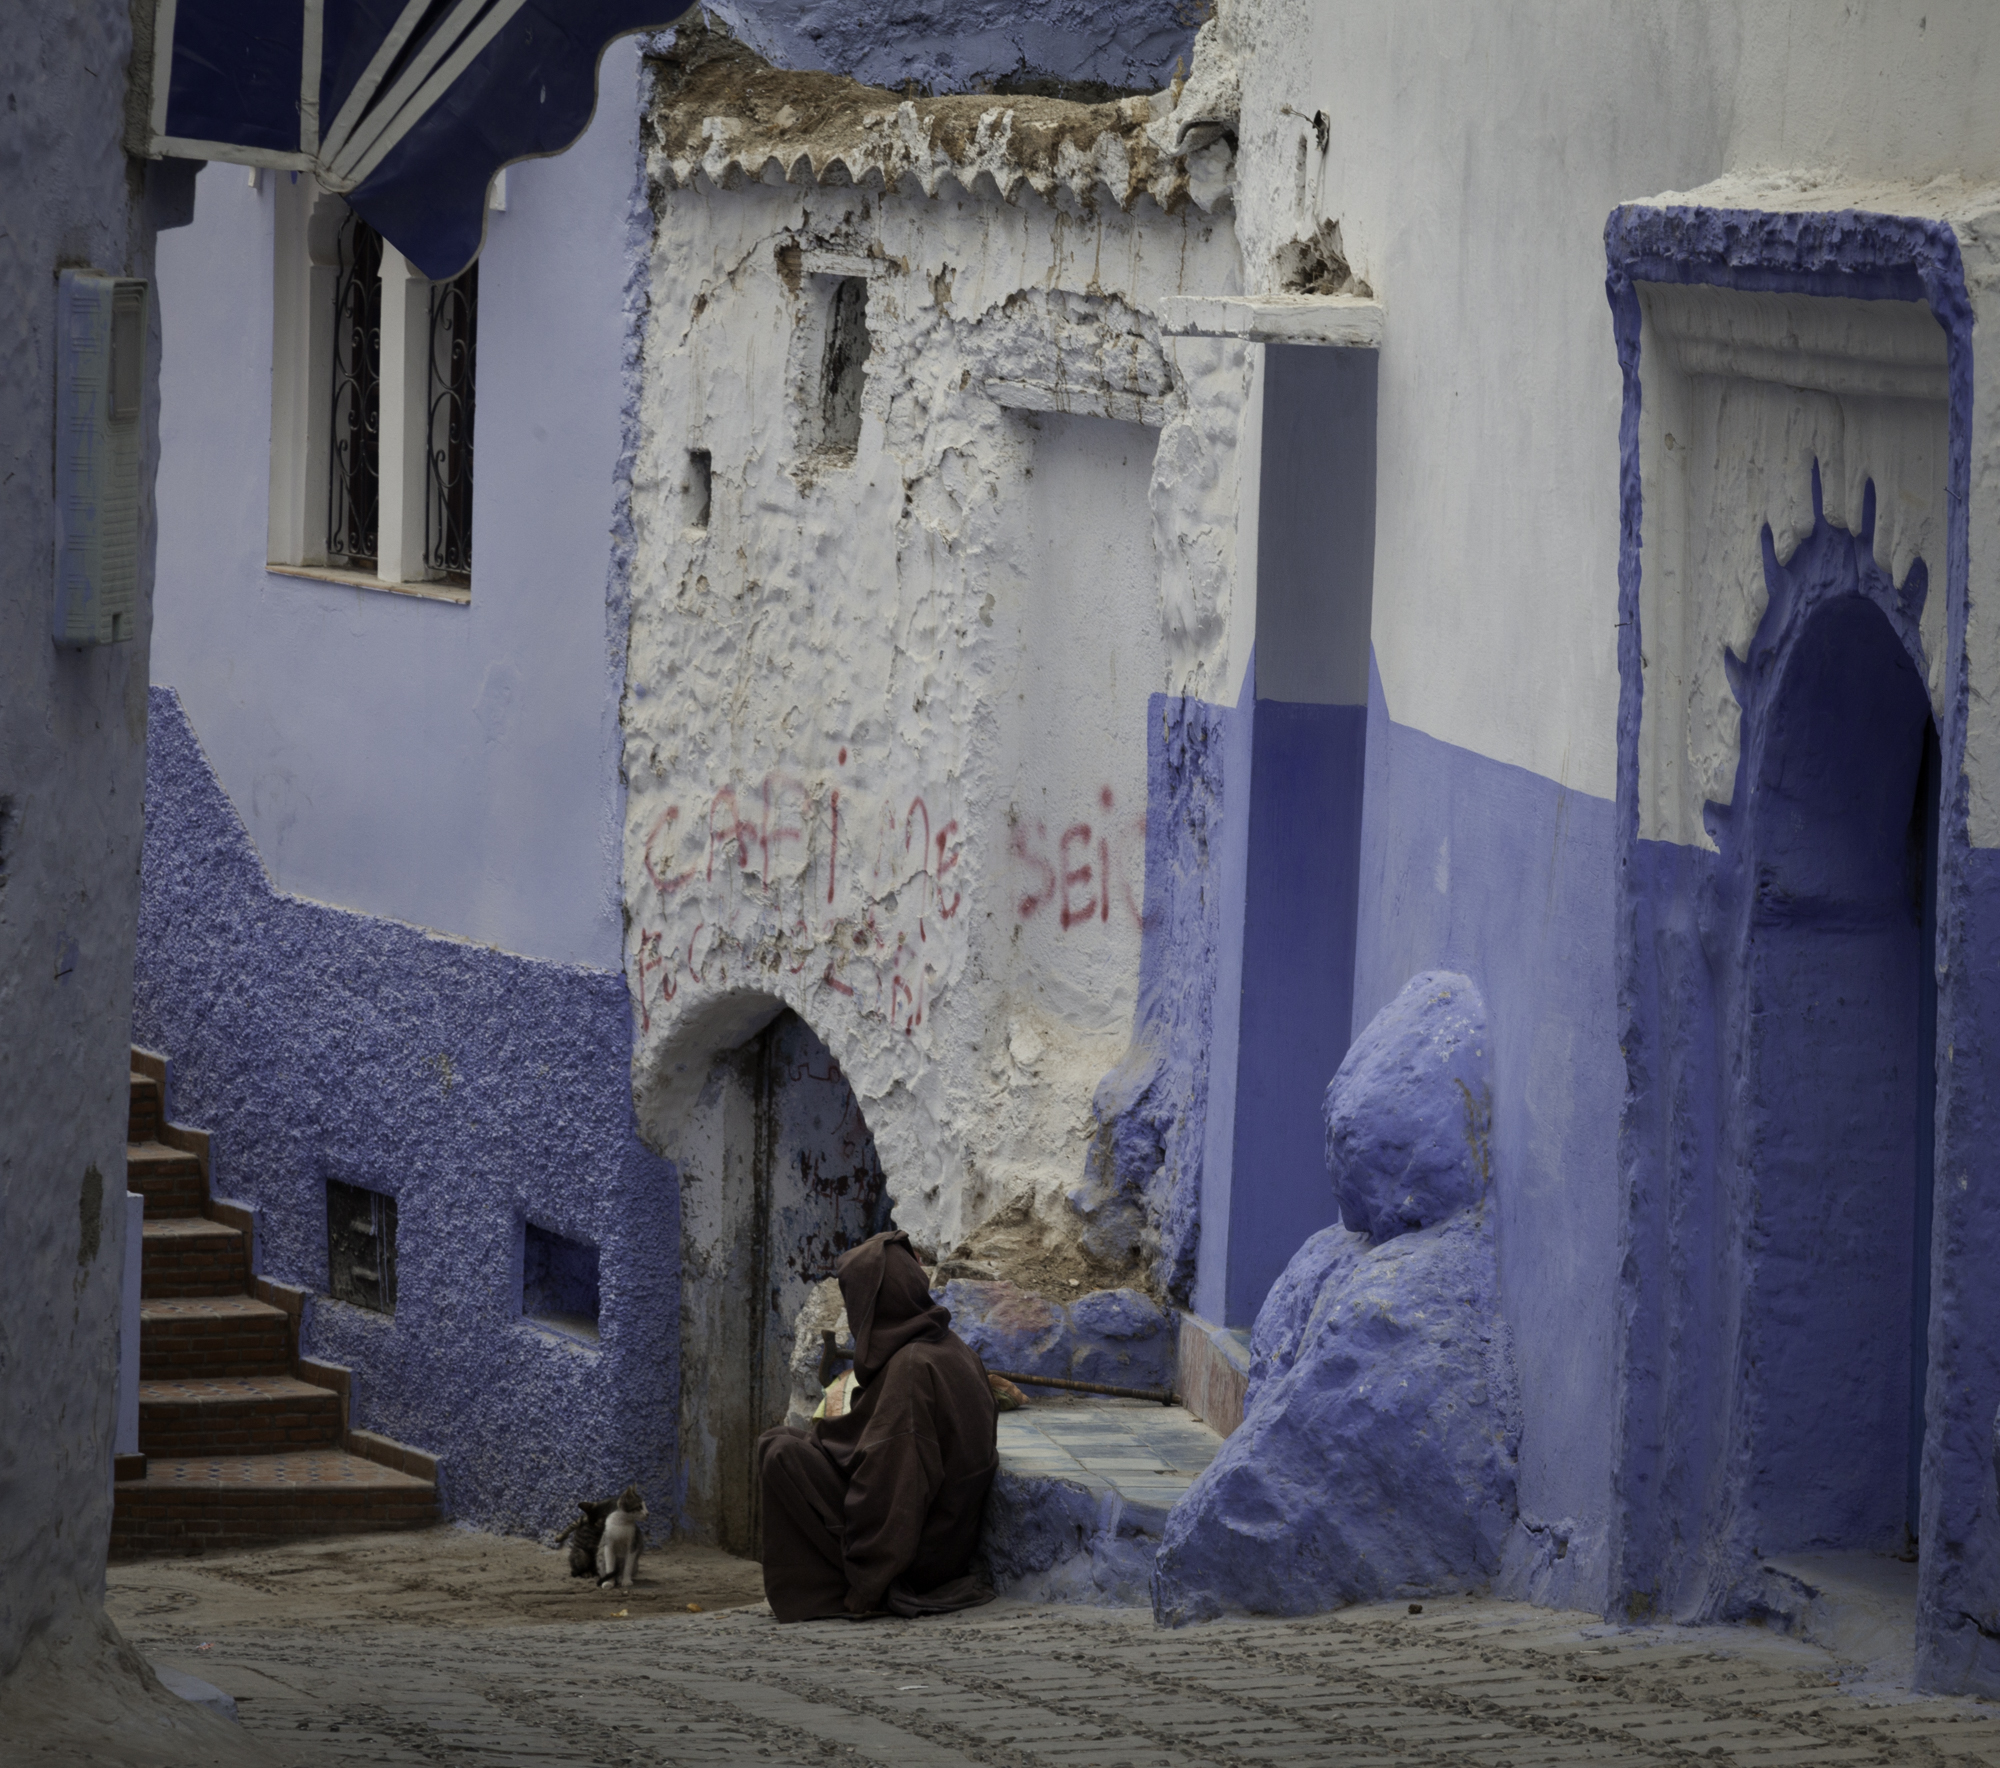 Morocco-2-23.jpg